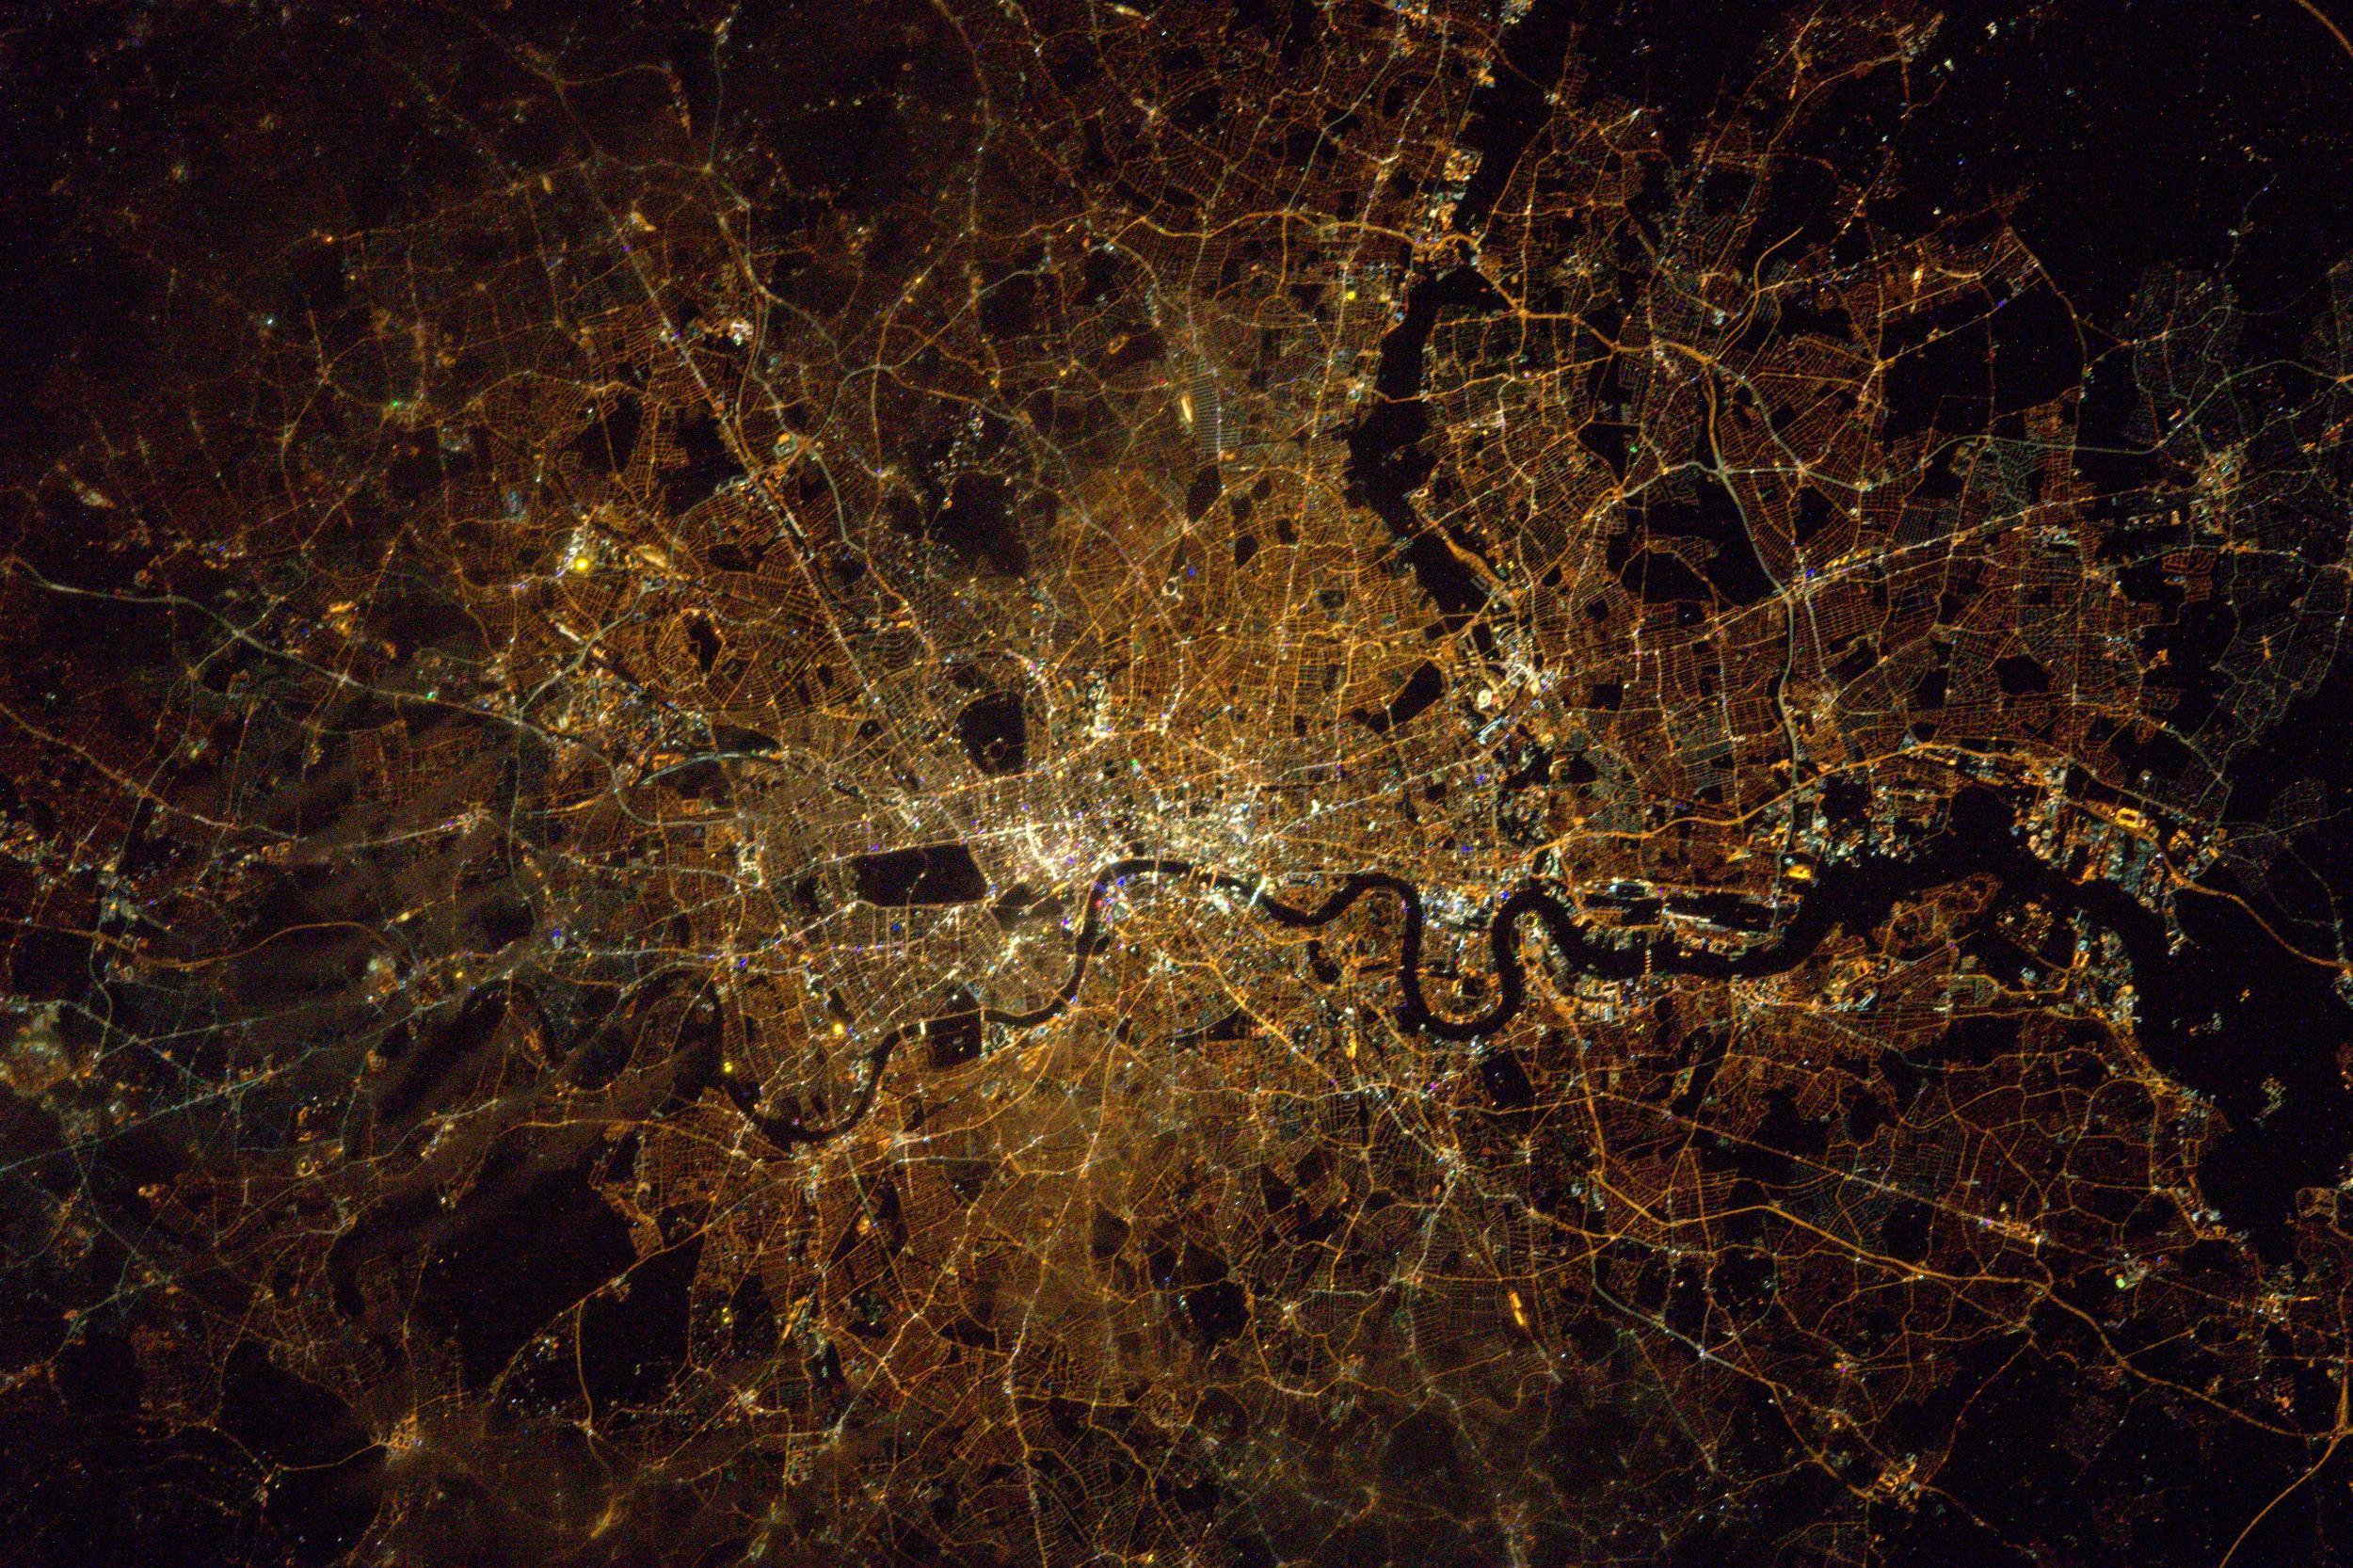 British astronaut Tim Peake shares beautiful pictures of ...